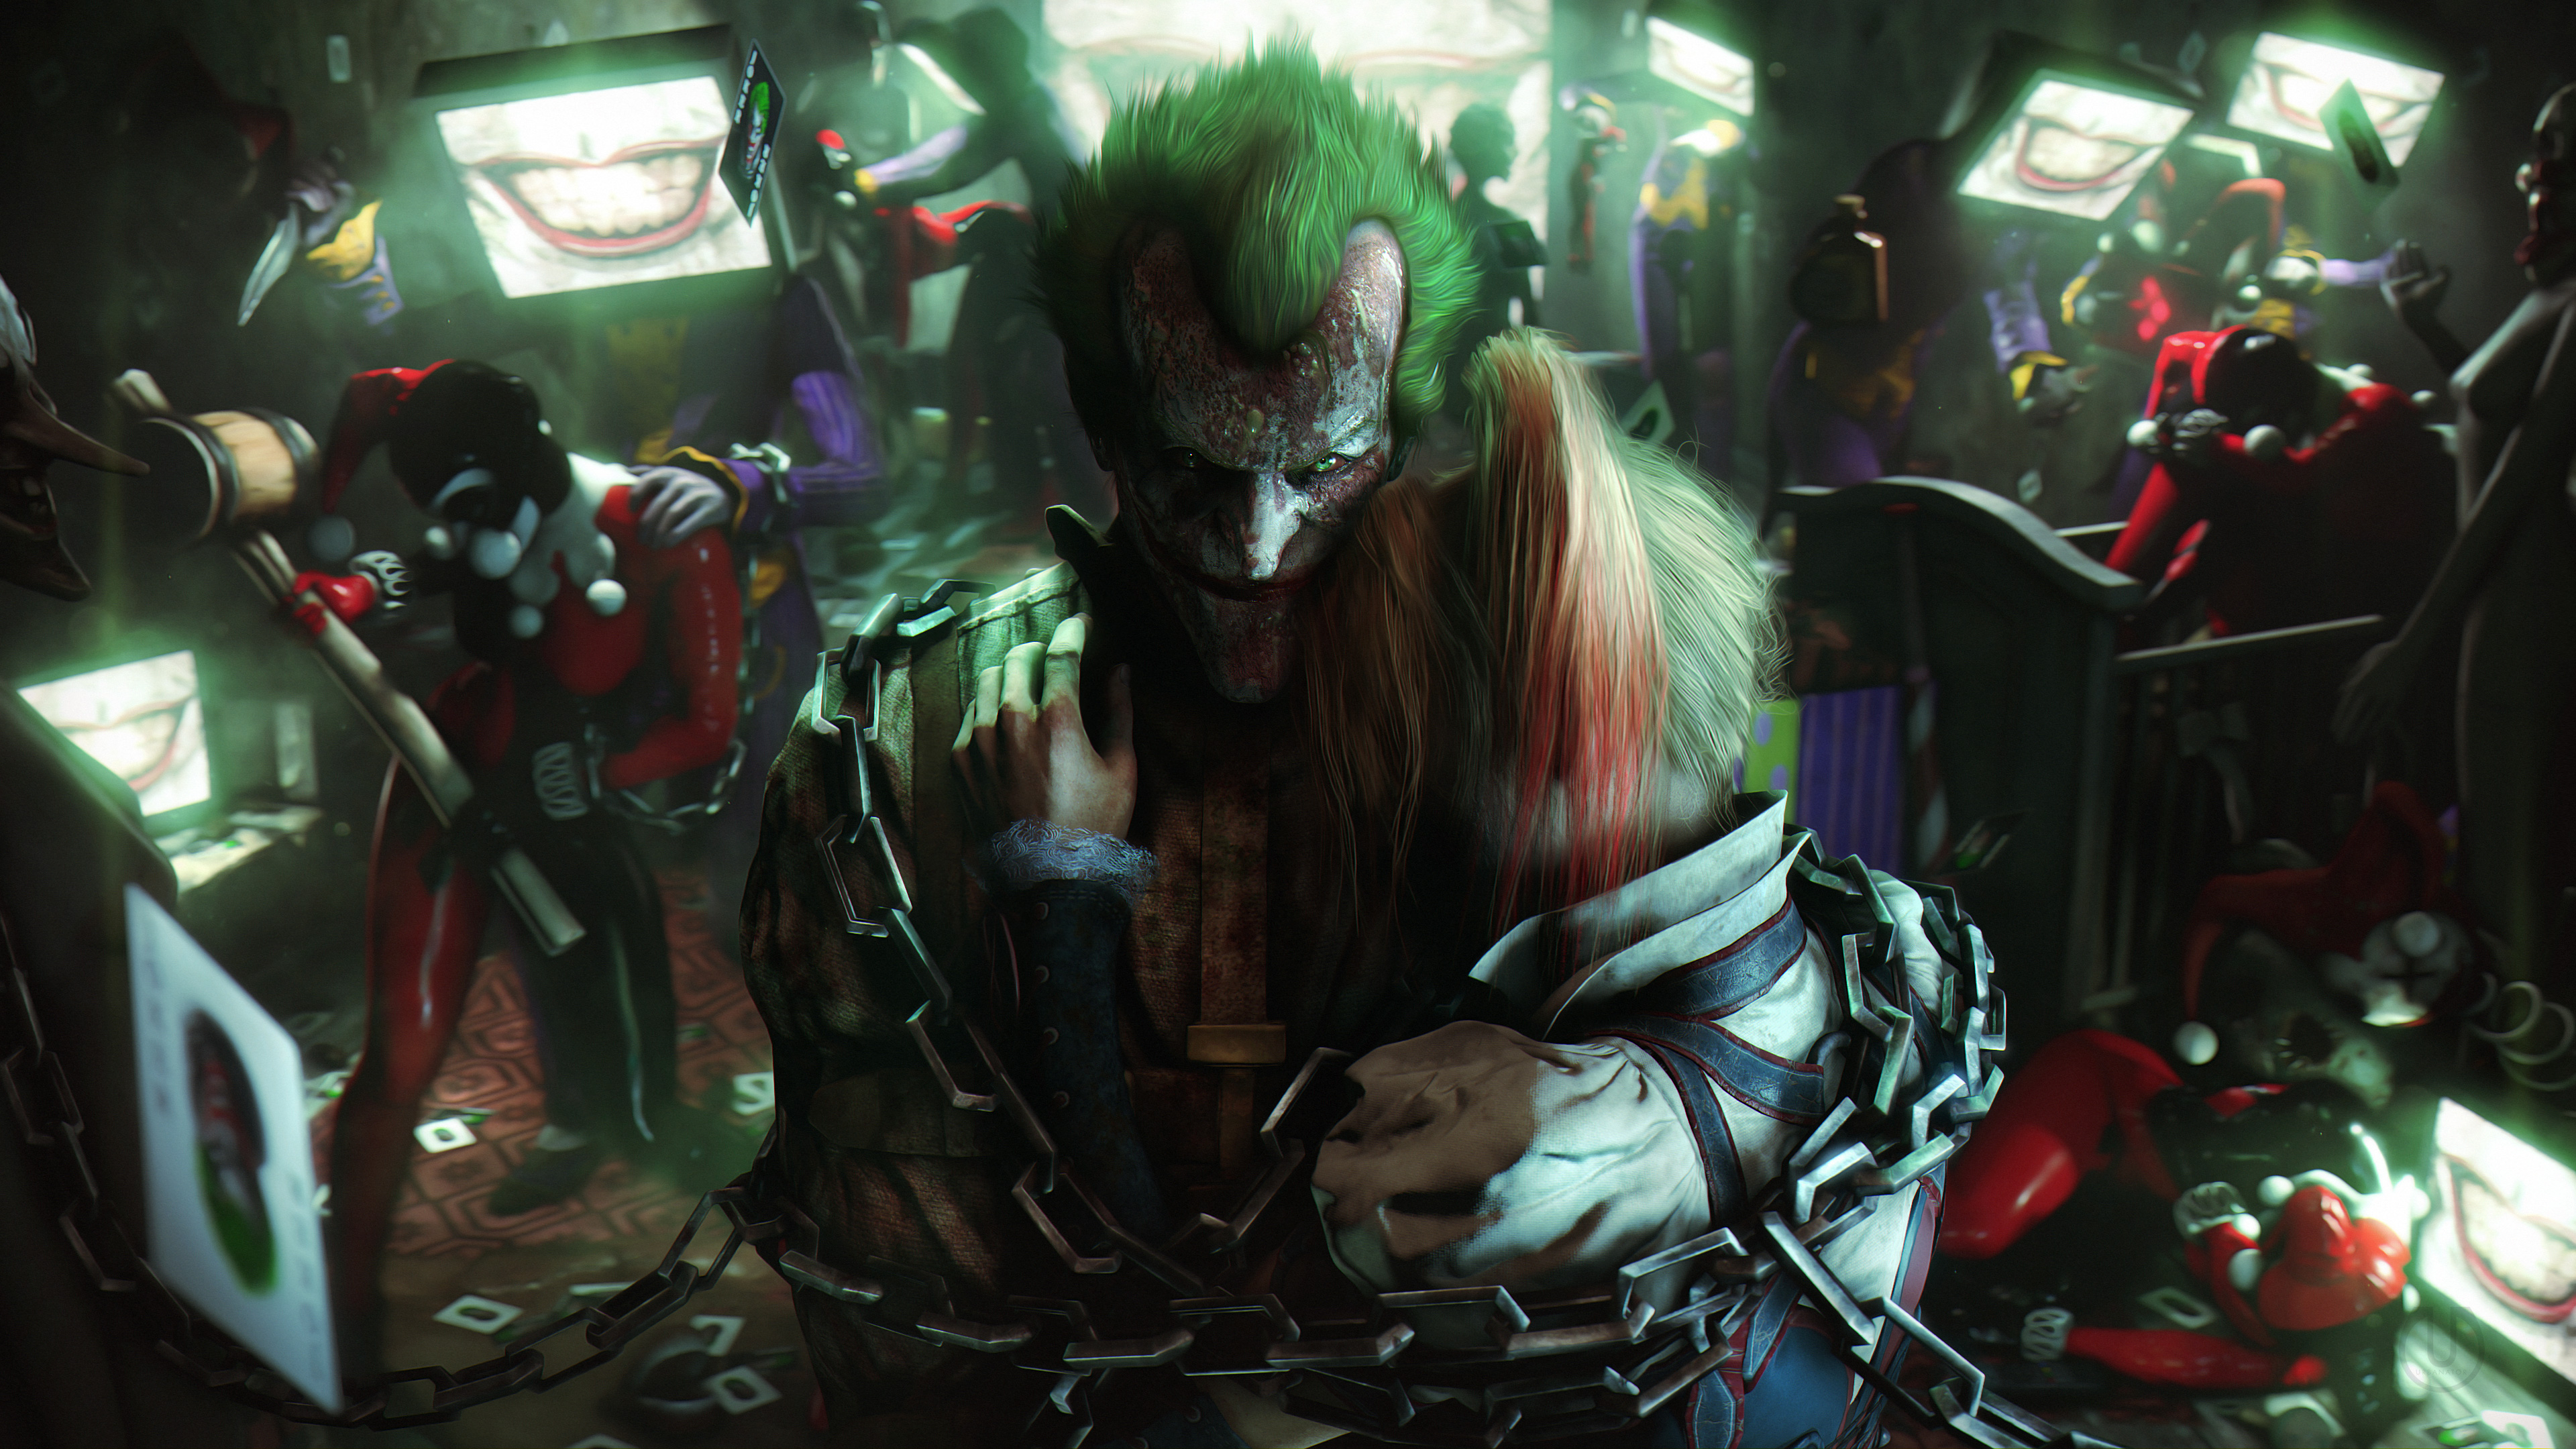 Joker And Harley Quinn Fan Art, HD Superheroes, 4k